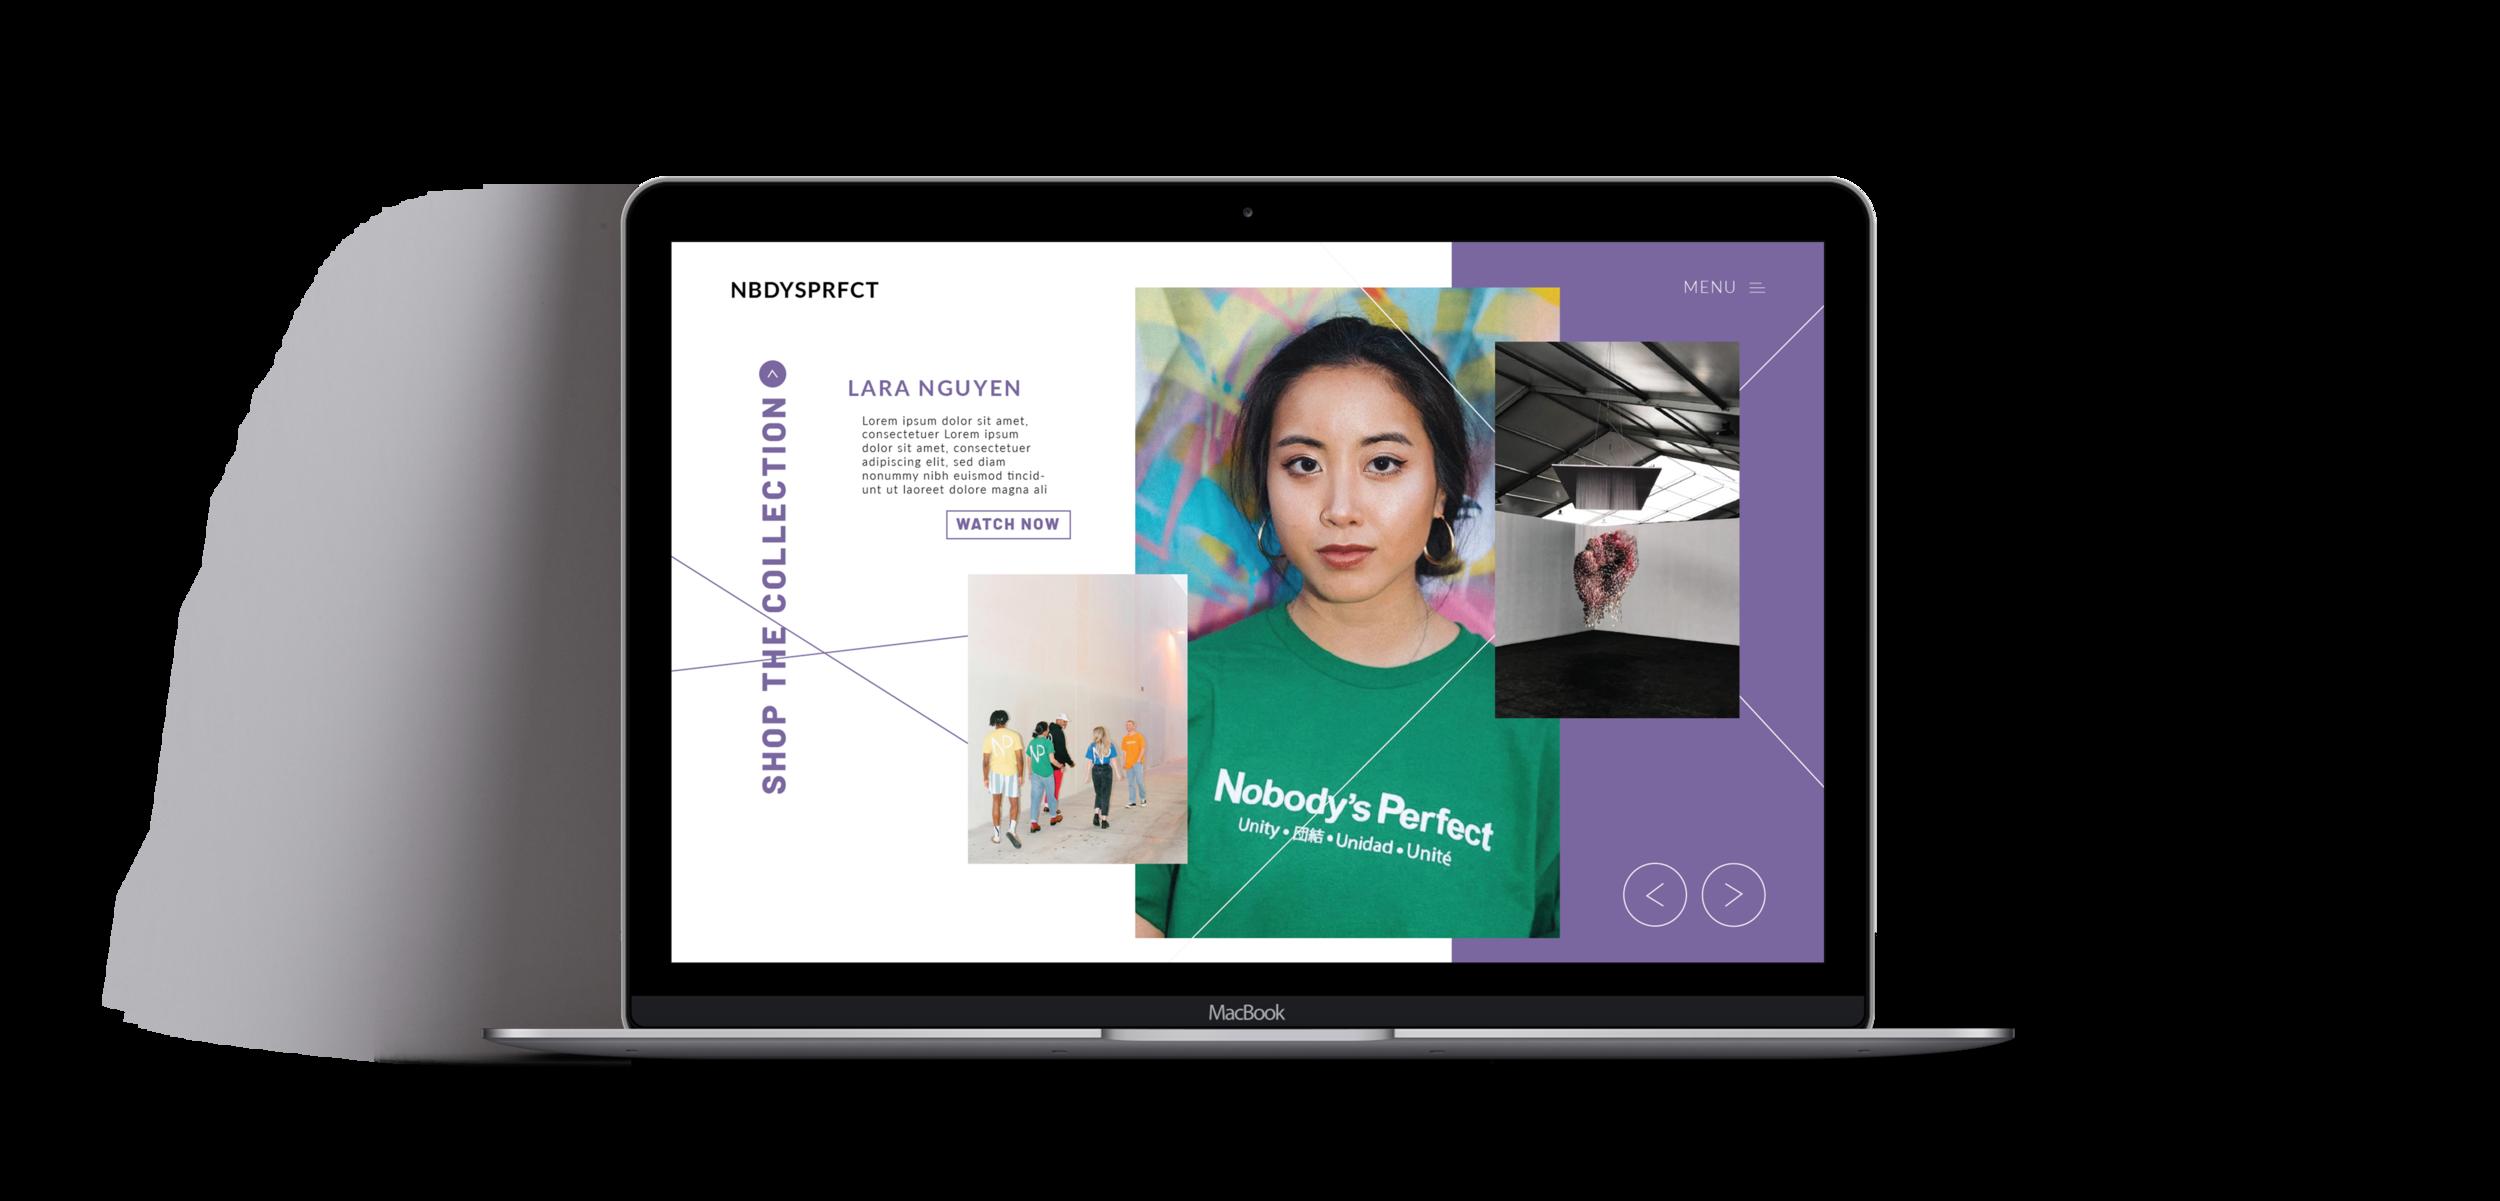 Web-Showcase-Project-Presentation.png